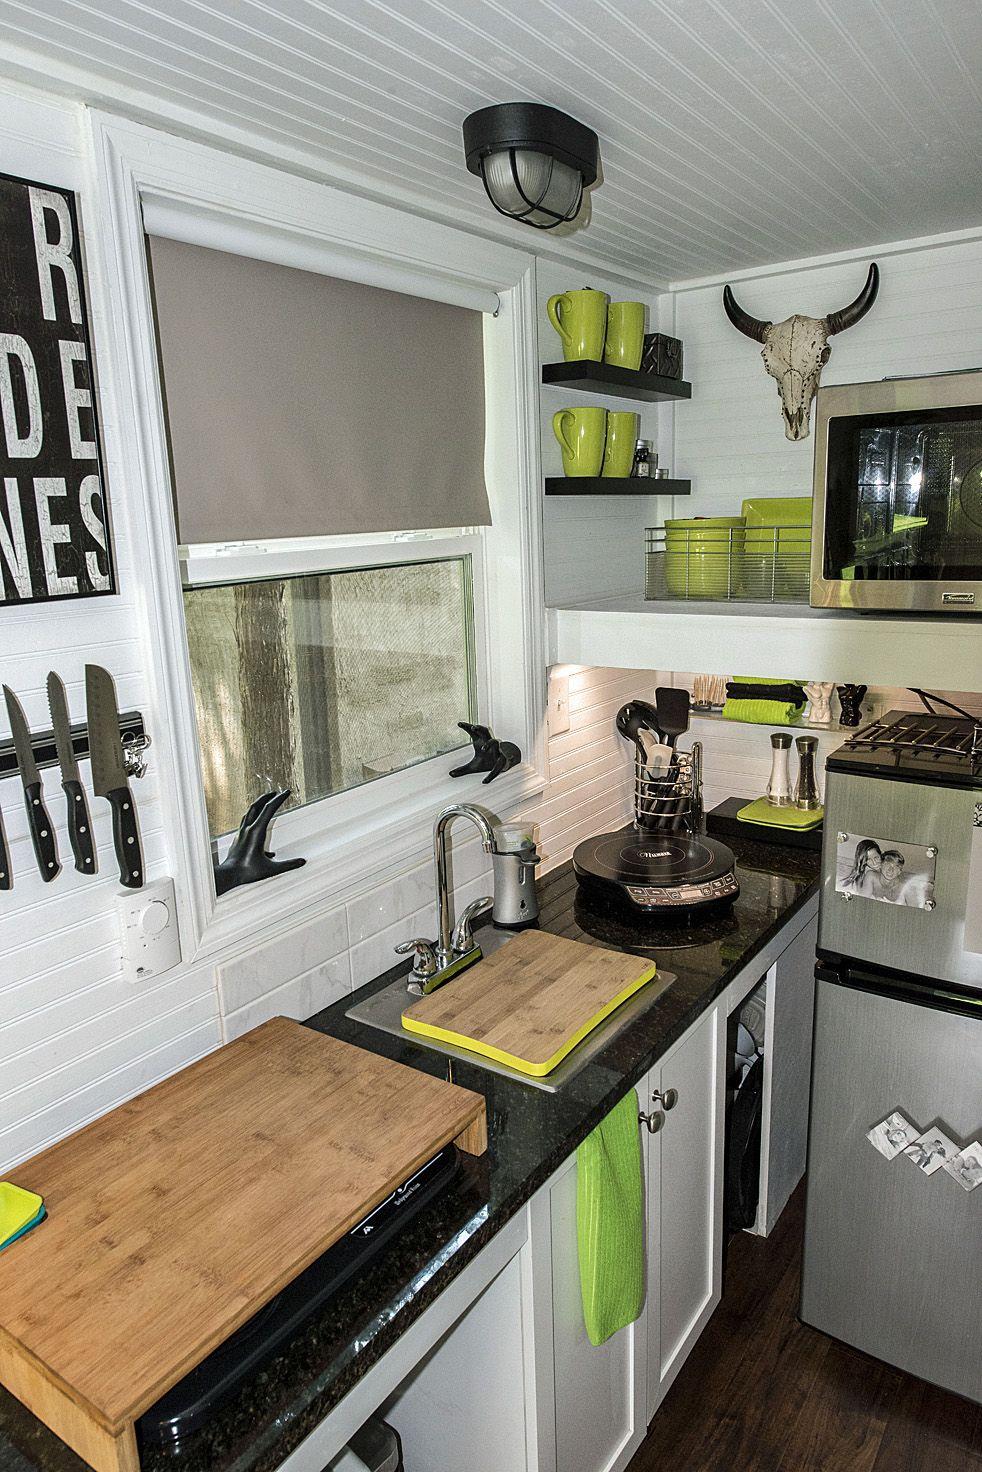 Best Butcher Block Counter On Range Sink Mendy S Shoebox Tiny 640 x 480